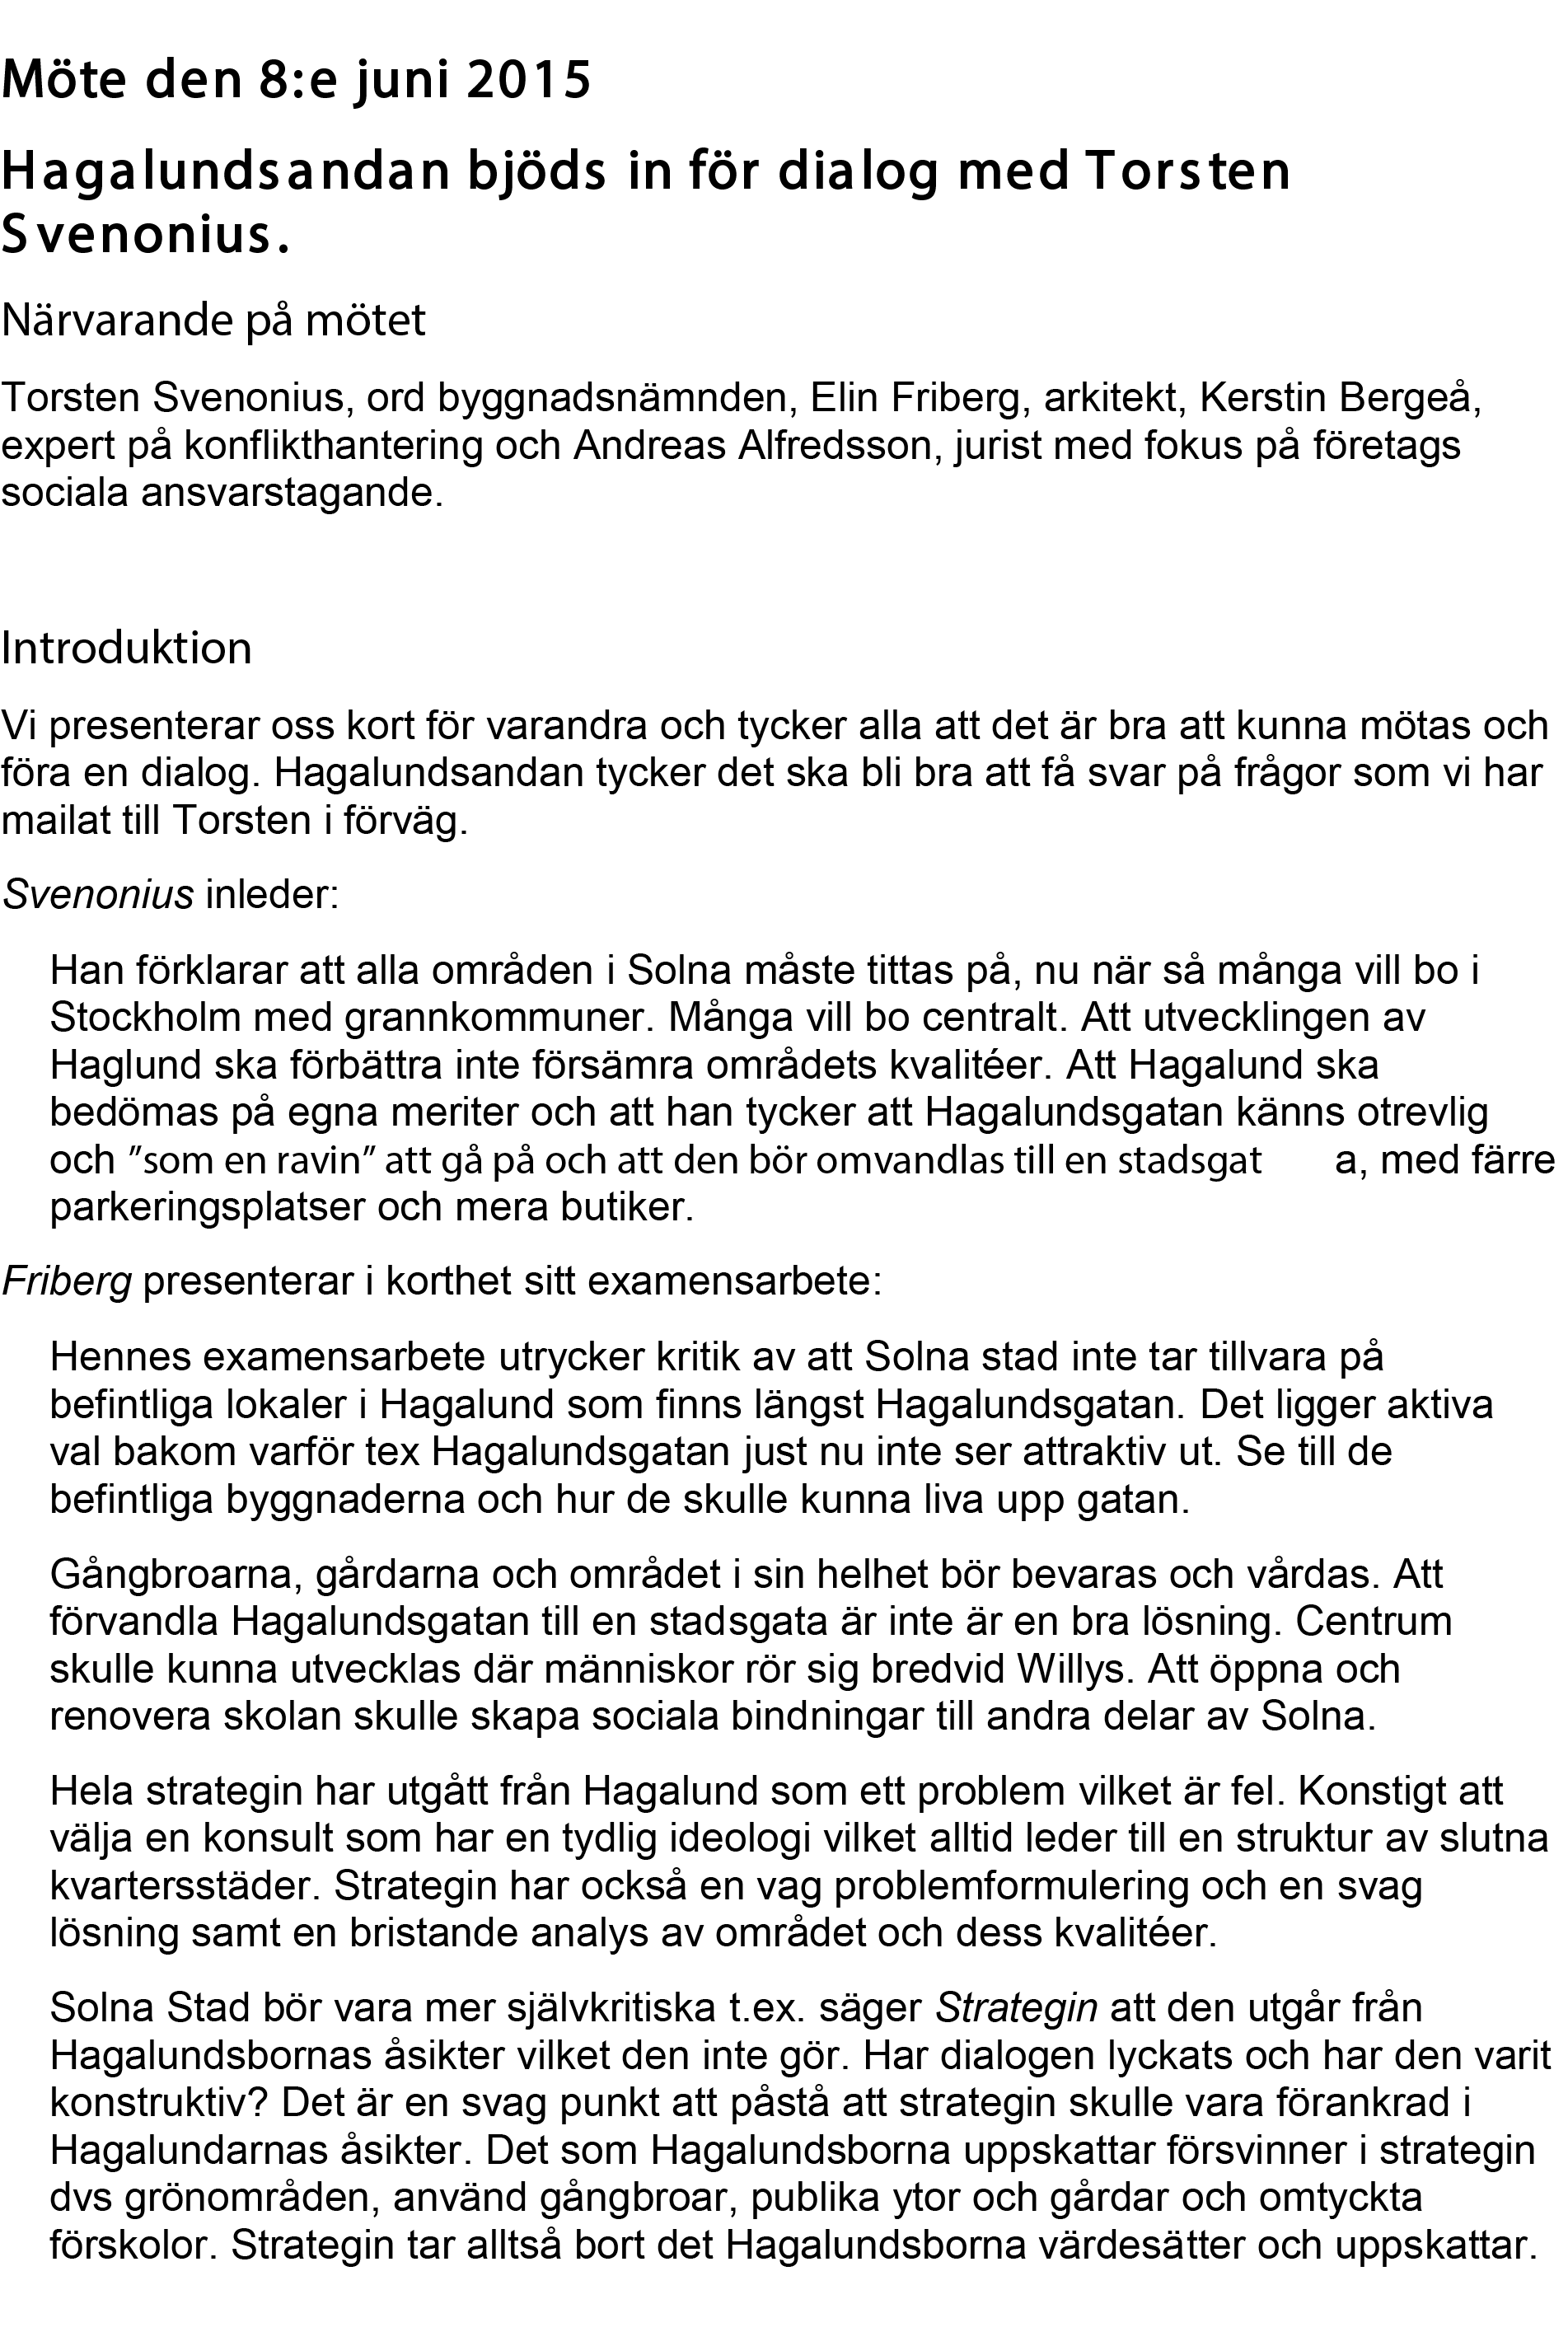 Möte med Svenonius 2015-06-08